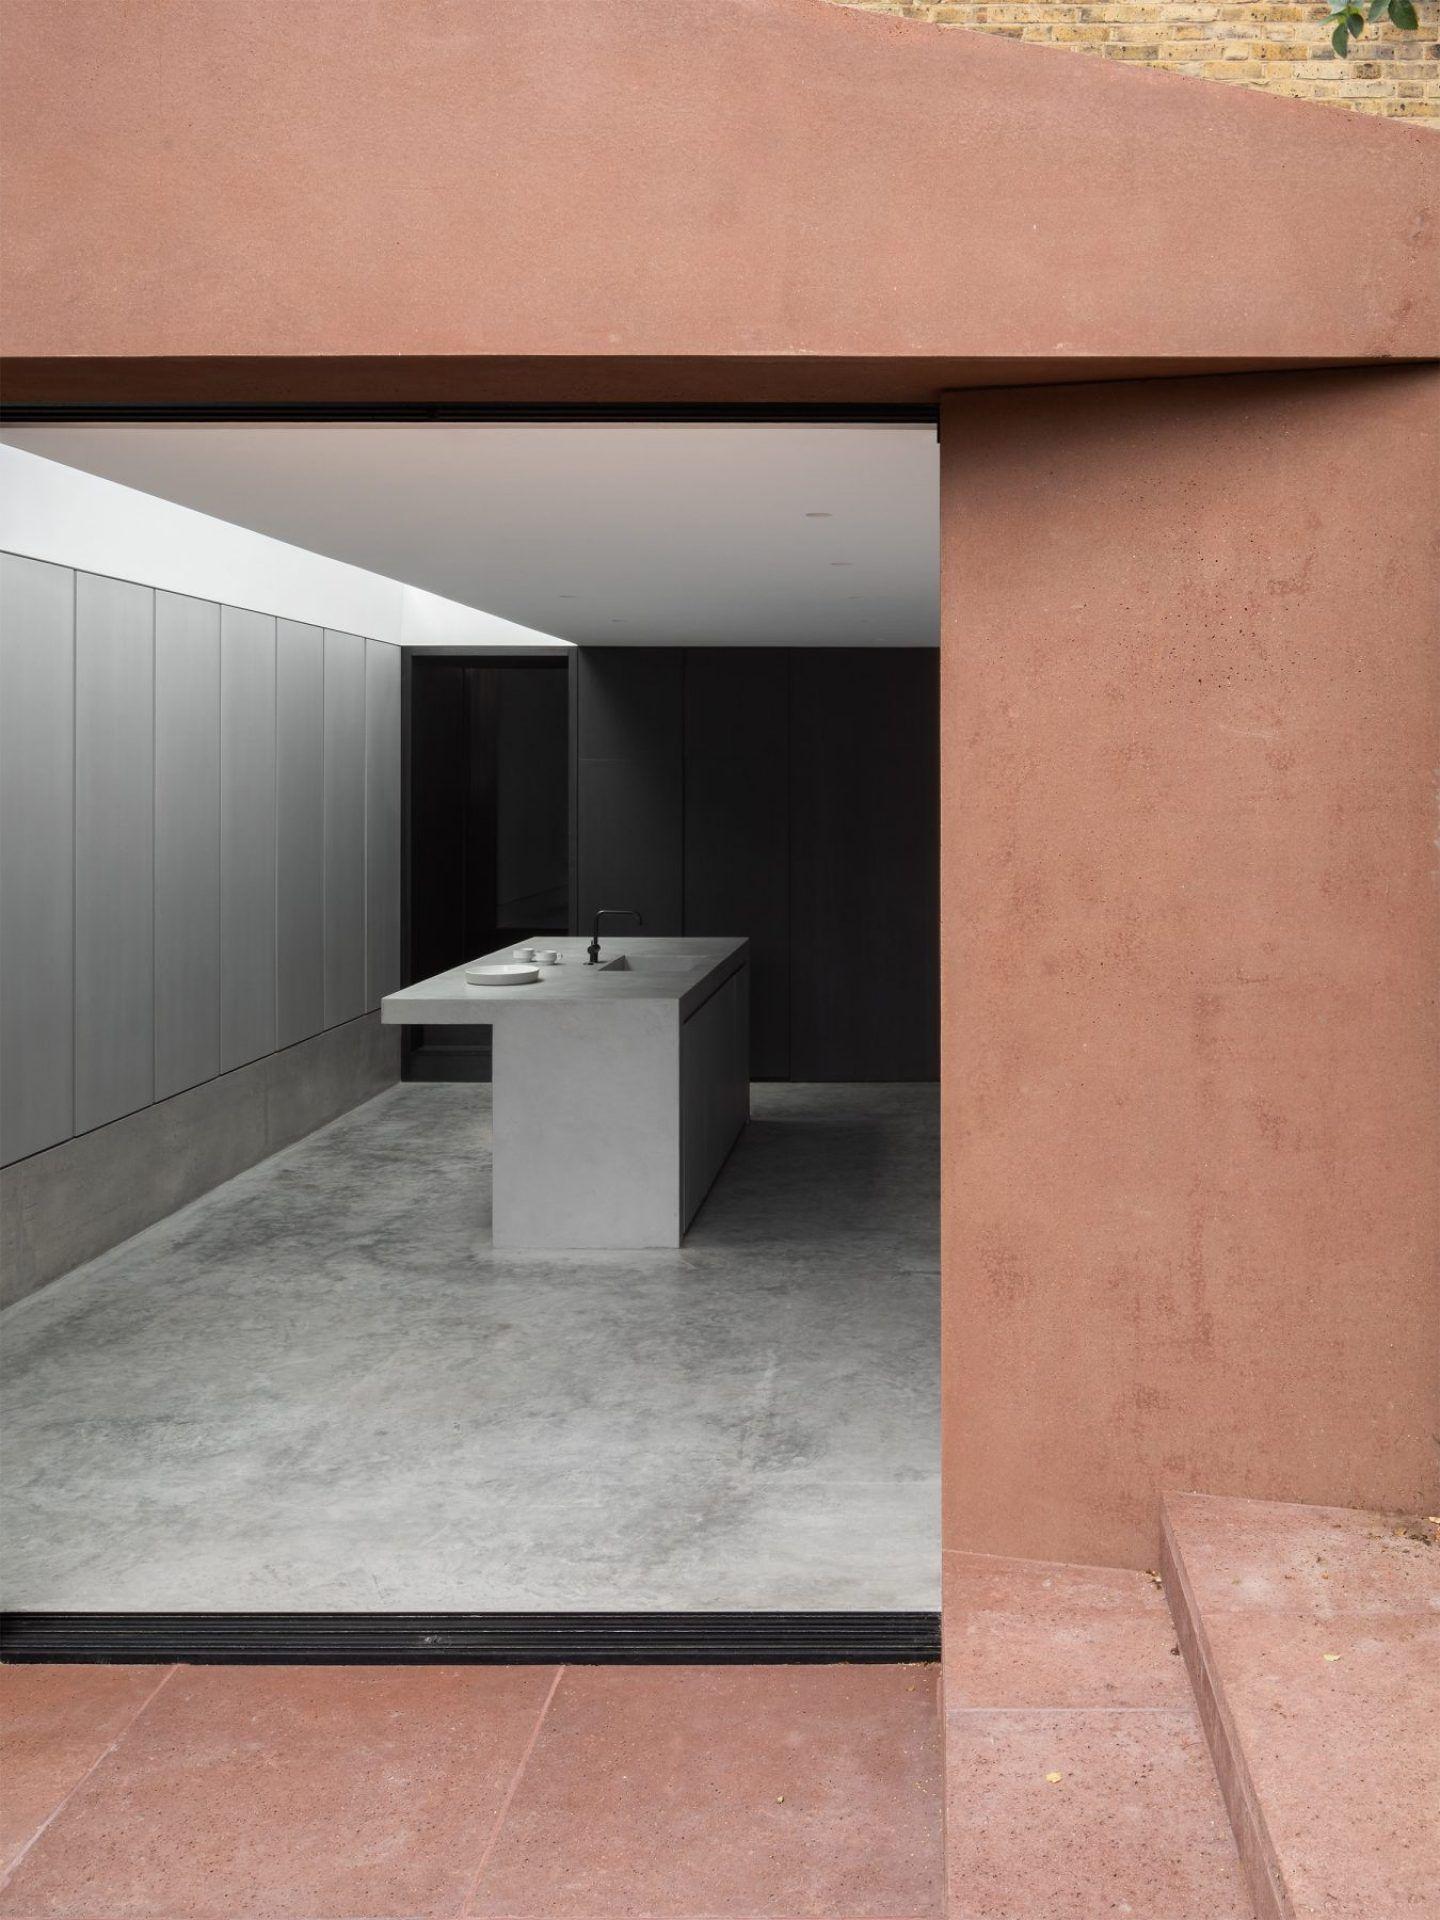 IGNANT-Architecture-Al-Jawad-Pike-Elsley-Road5